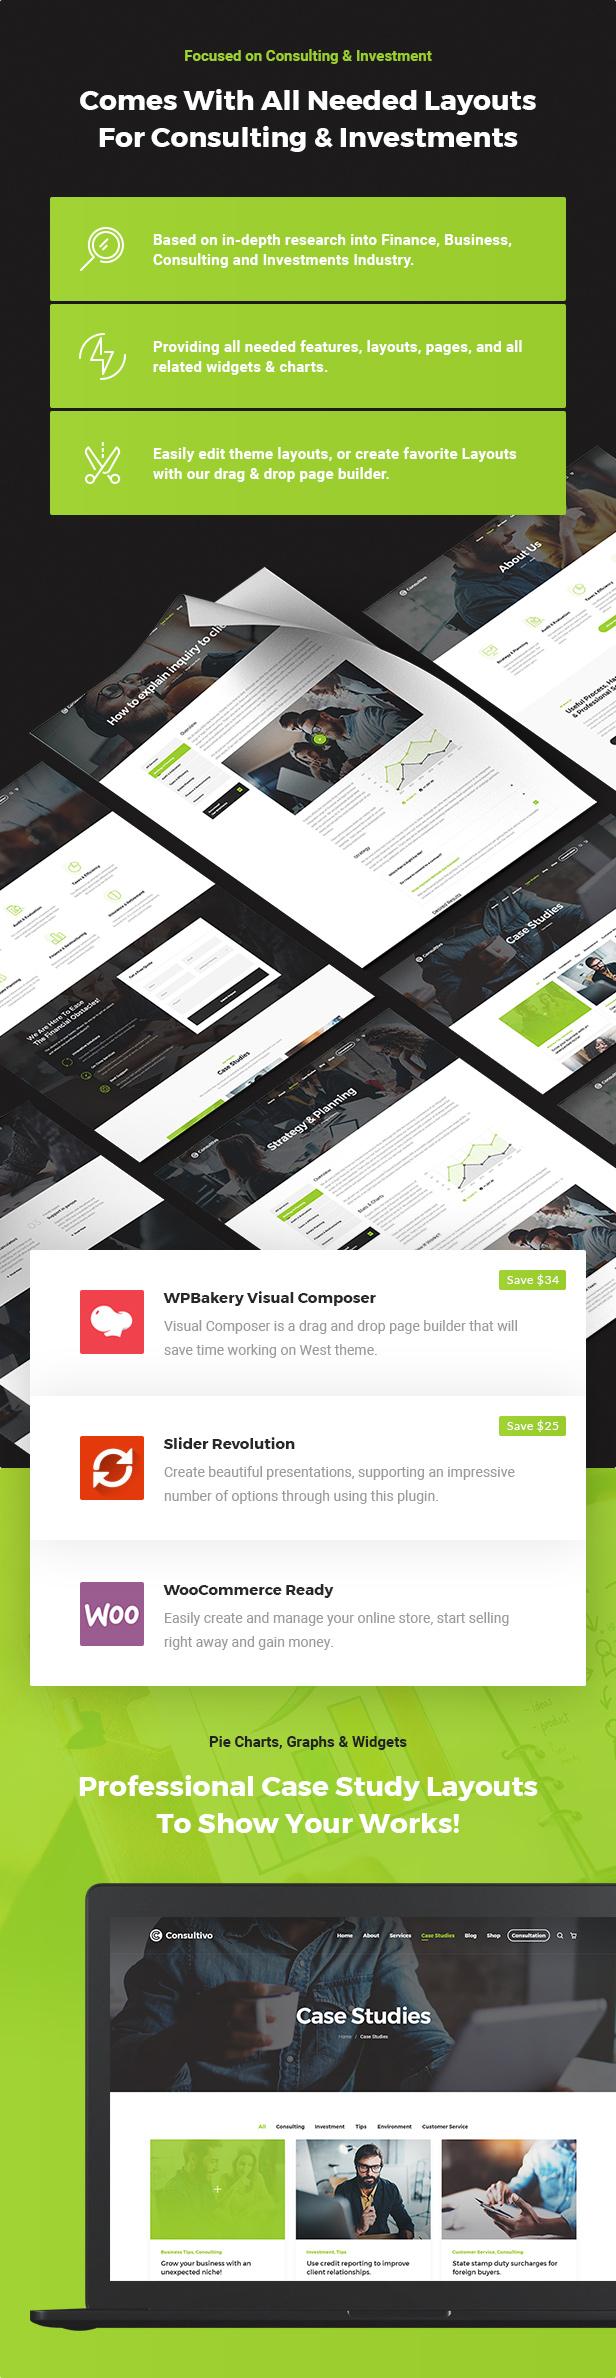 Consultivo - Unternehmensberatung und Investitionen WordPress Theme - 6